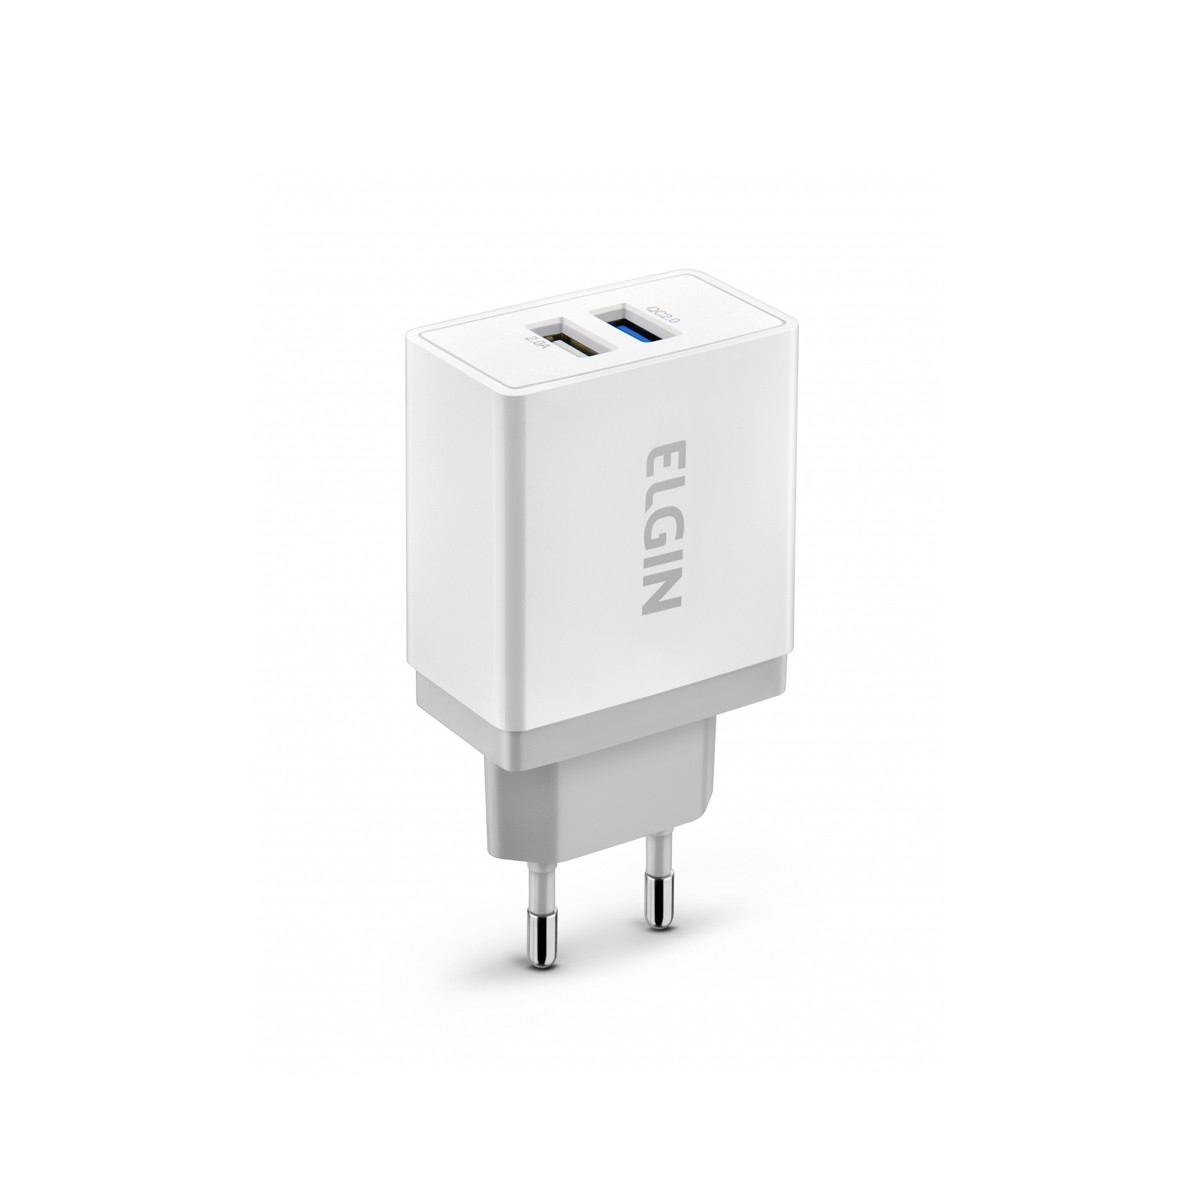 Carregador USB para Tomada Elgin Quick Charger com 2 Saída 2A 5V Potência 22W Bivolt